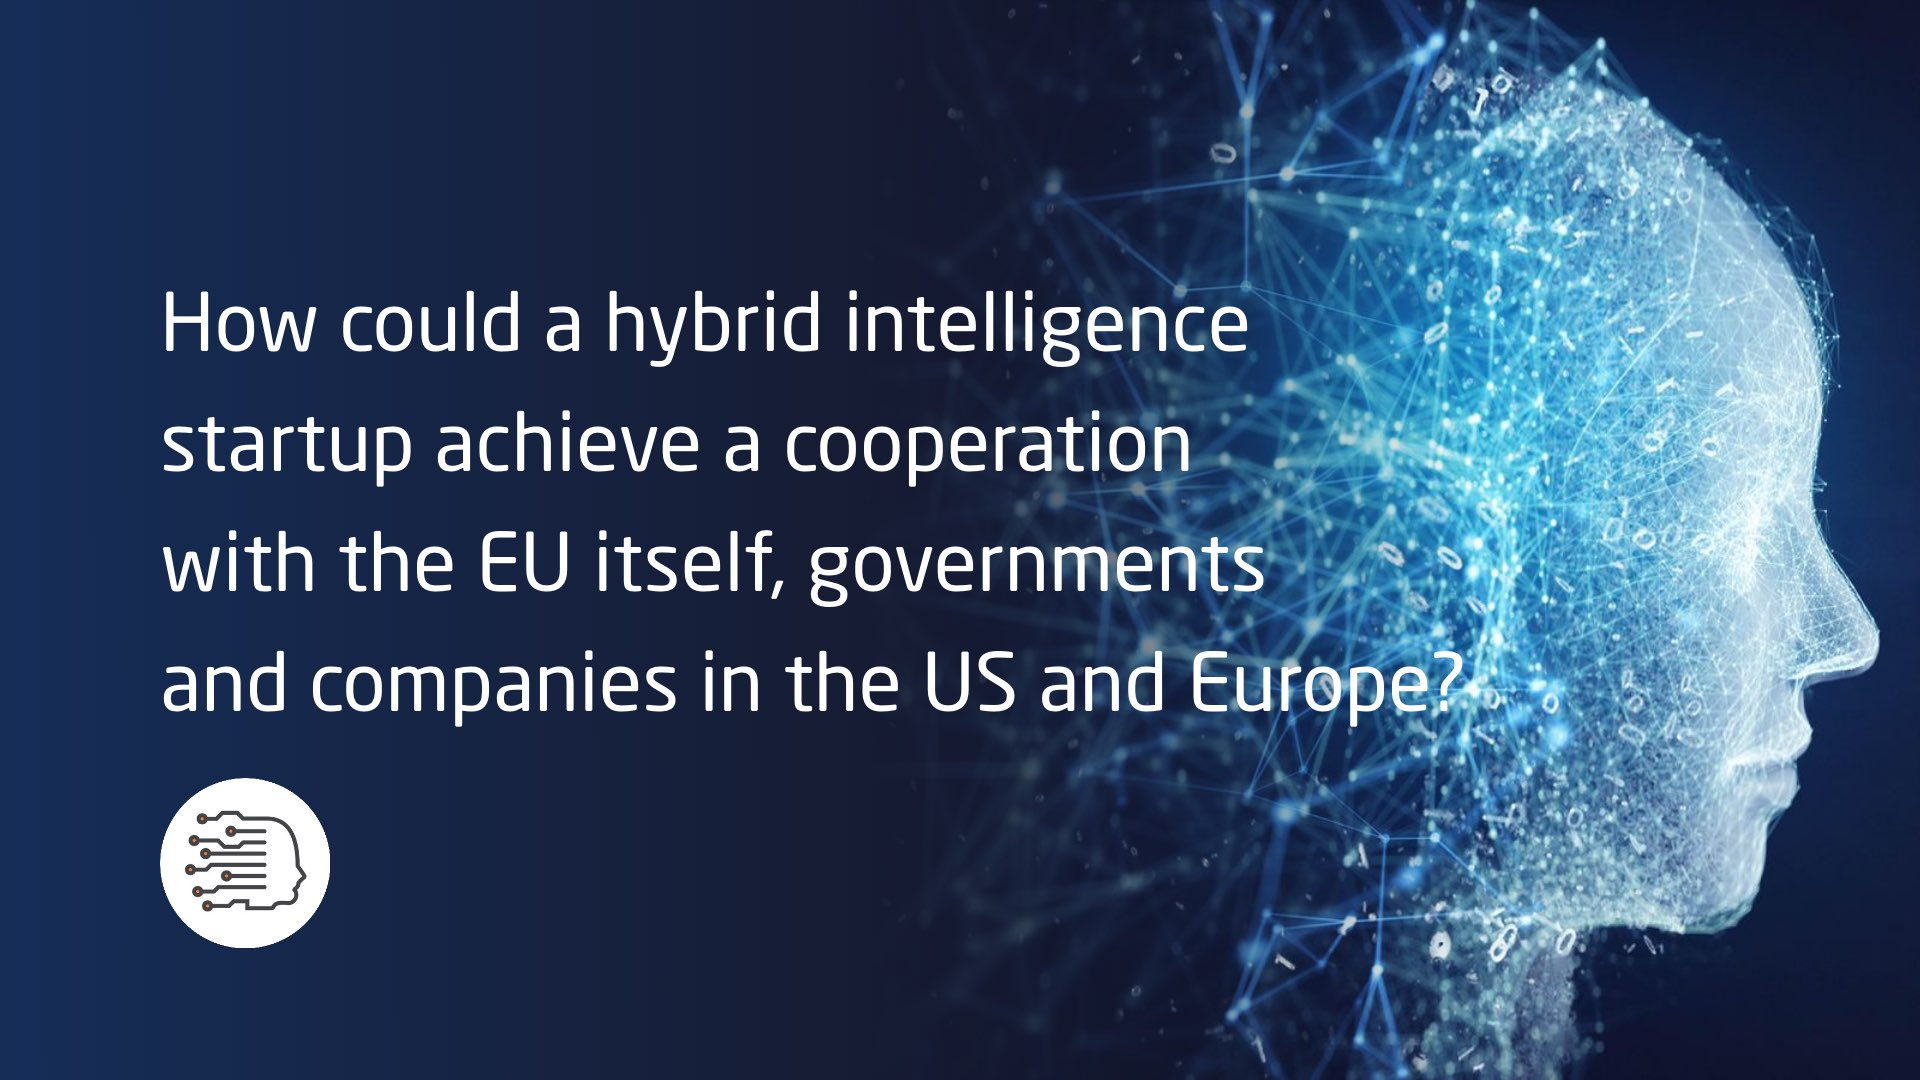 Hybrid intelligence startup